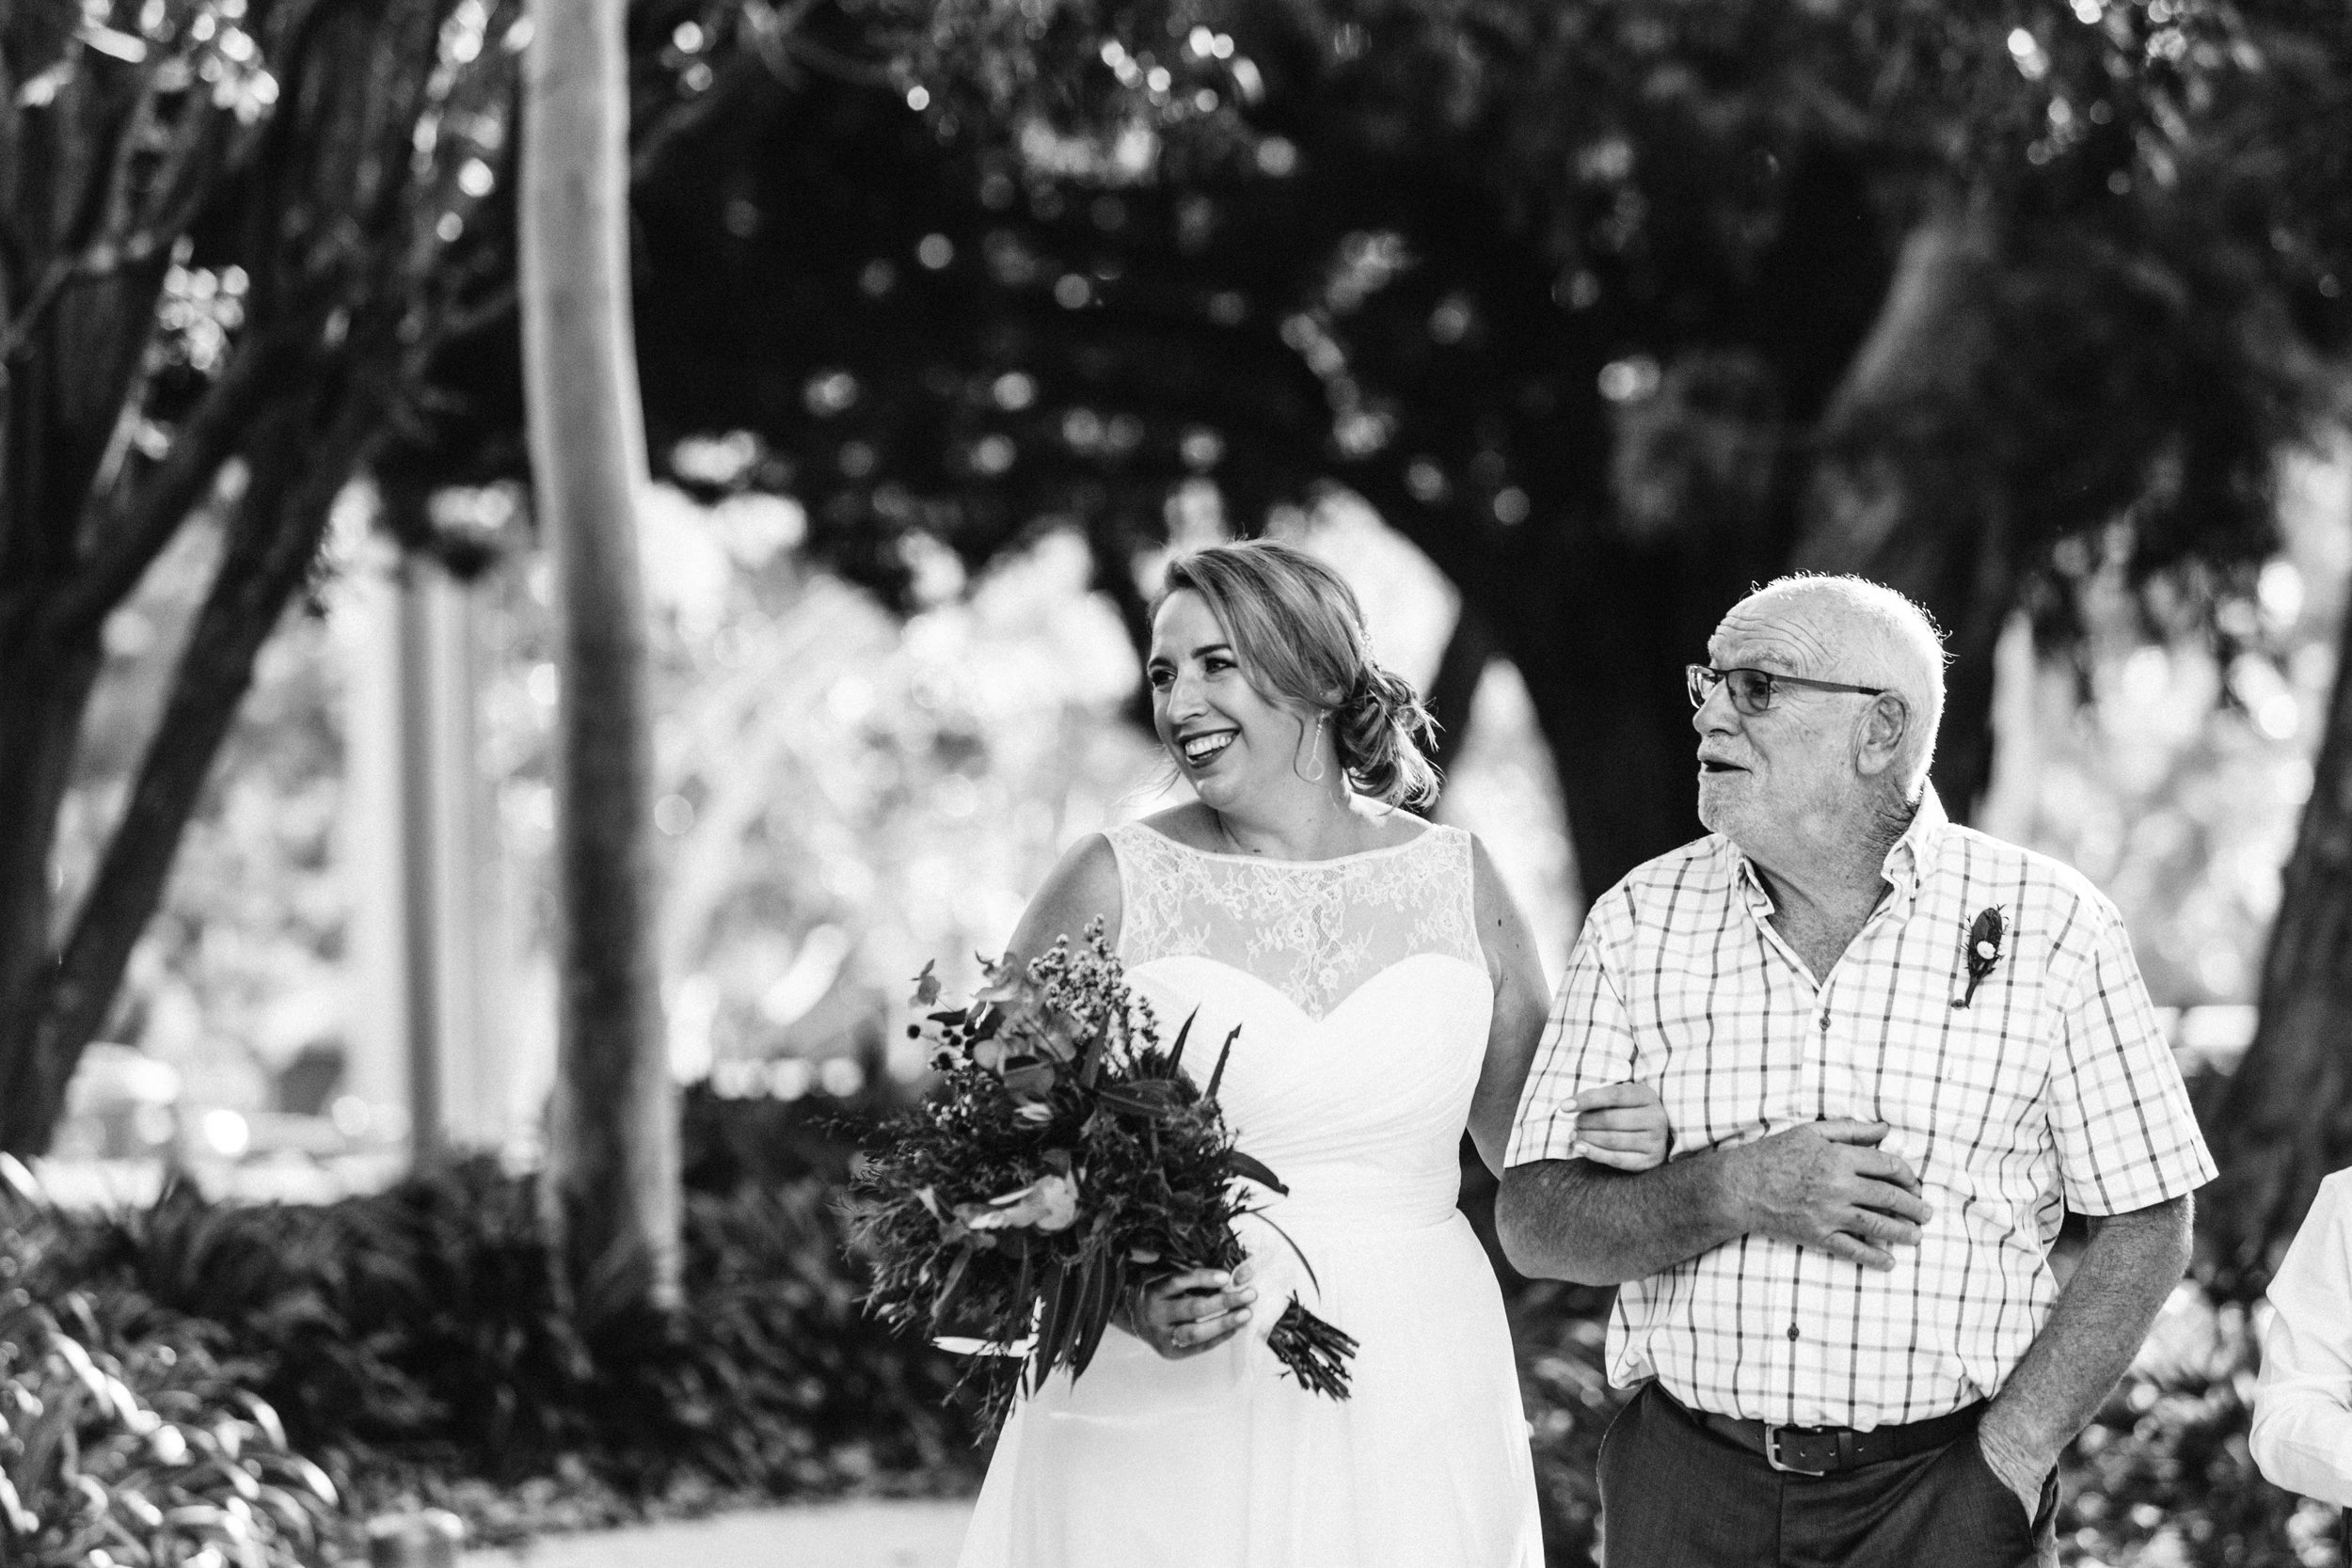 cabarita-park-sydney-wedding-emilyobrienphotography.net-13.jpg